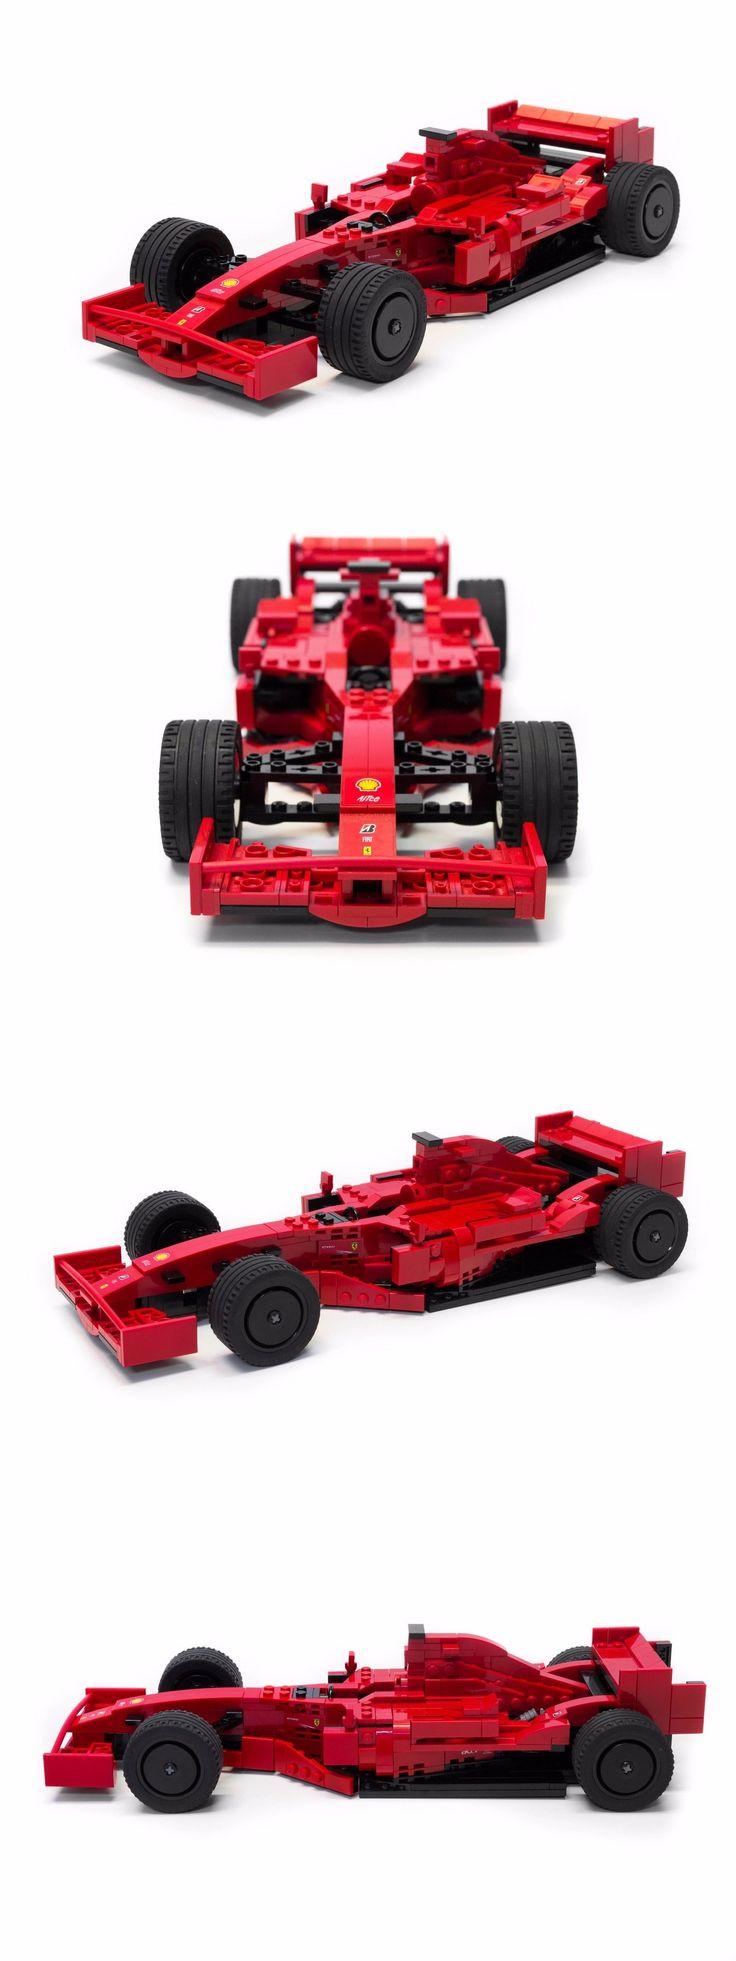 Details about LEGO Ferrari F2007 Formula 1 F1 Race Car